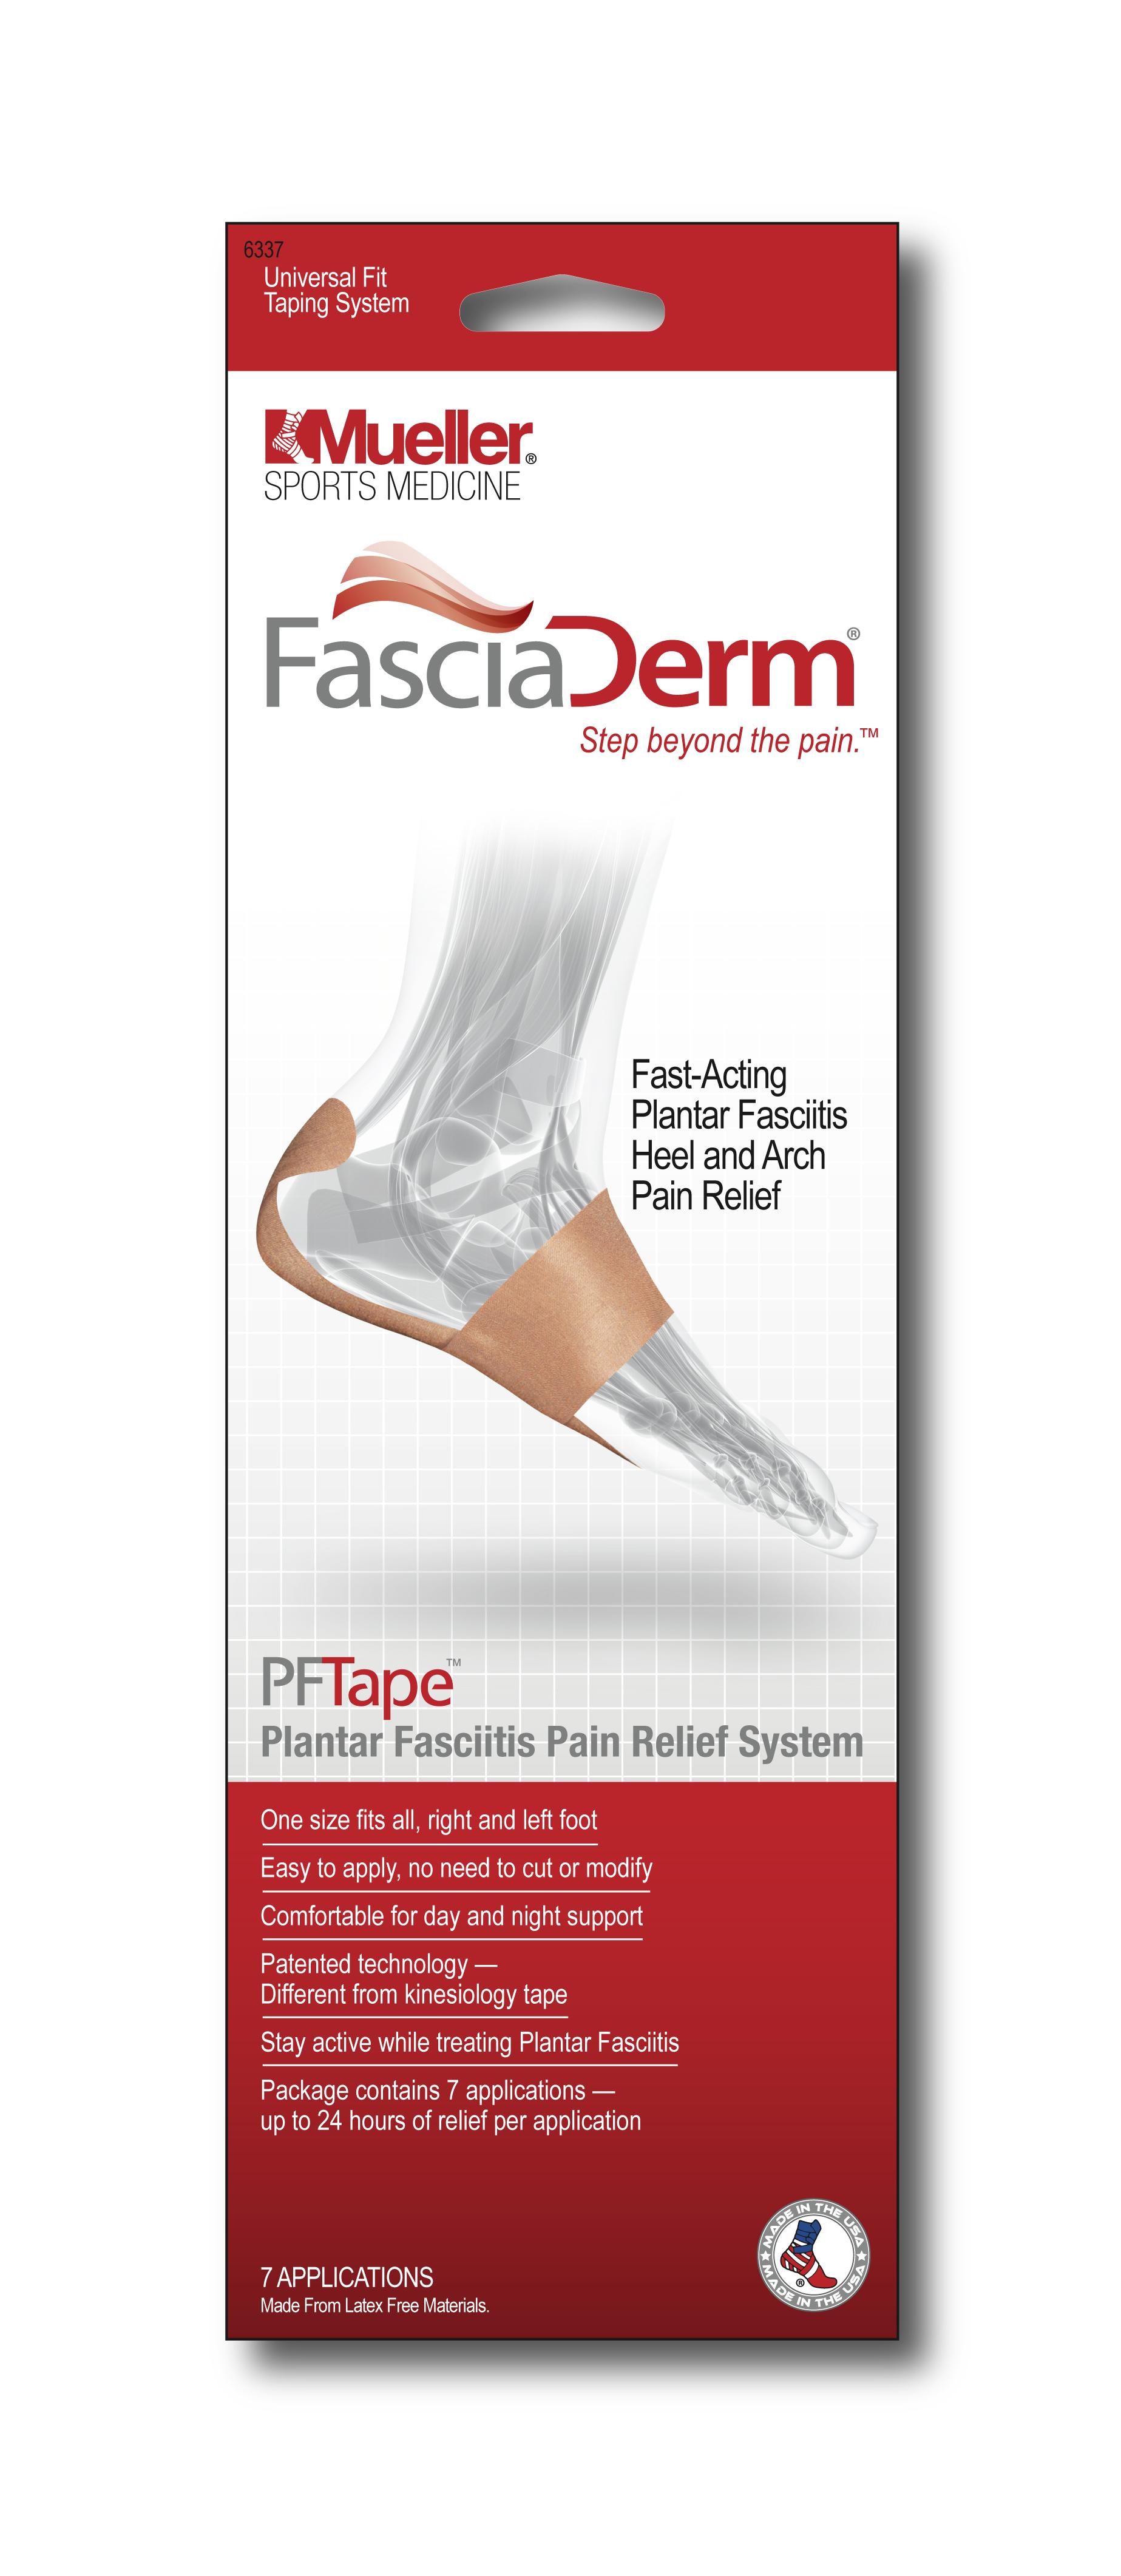 FasciaDerm_PFTape_System_for_Plantar_Fasciitis